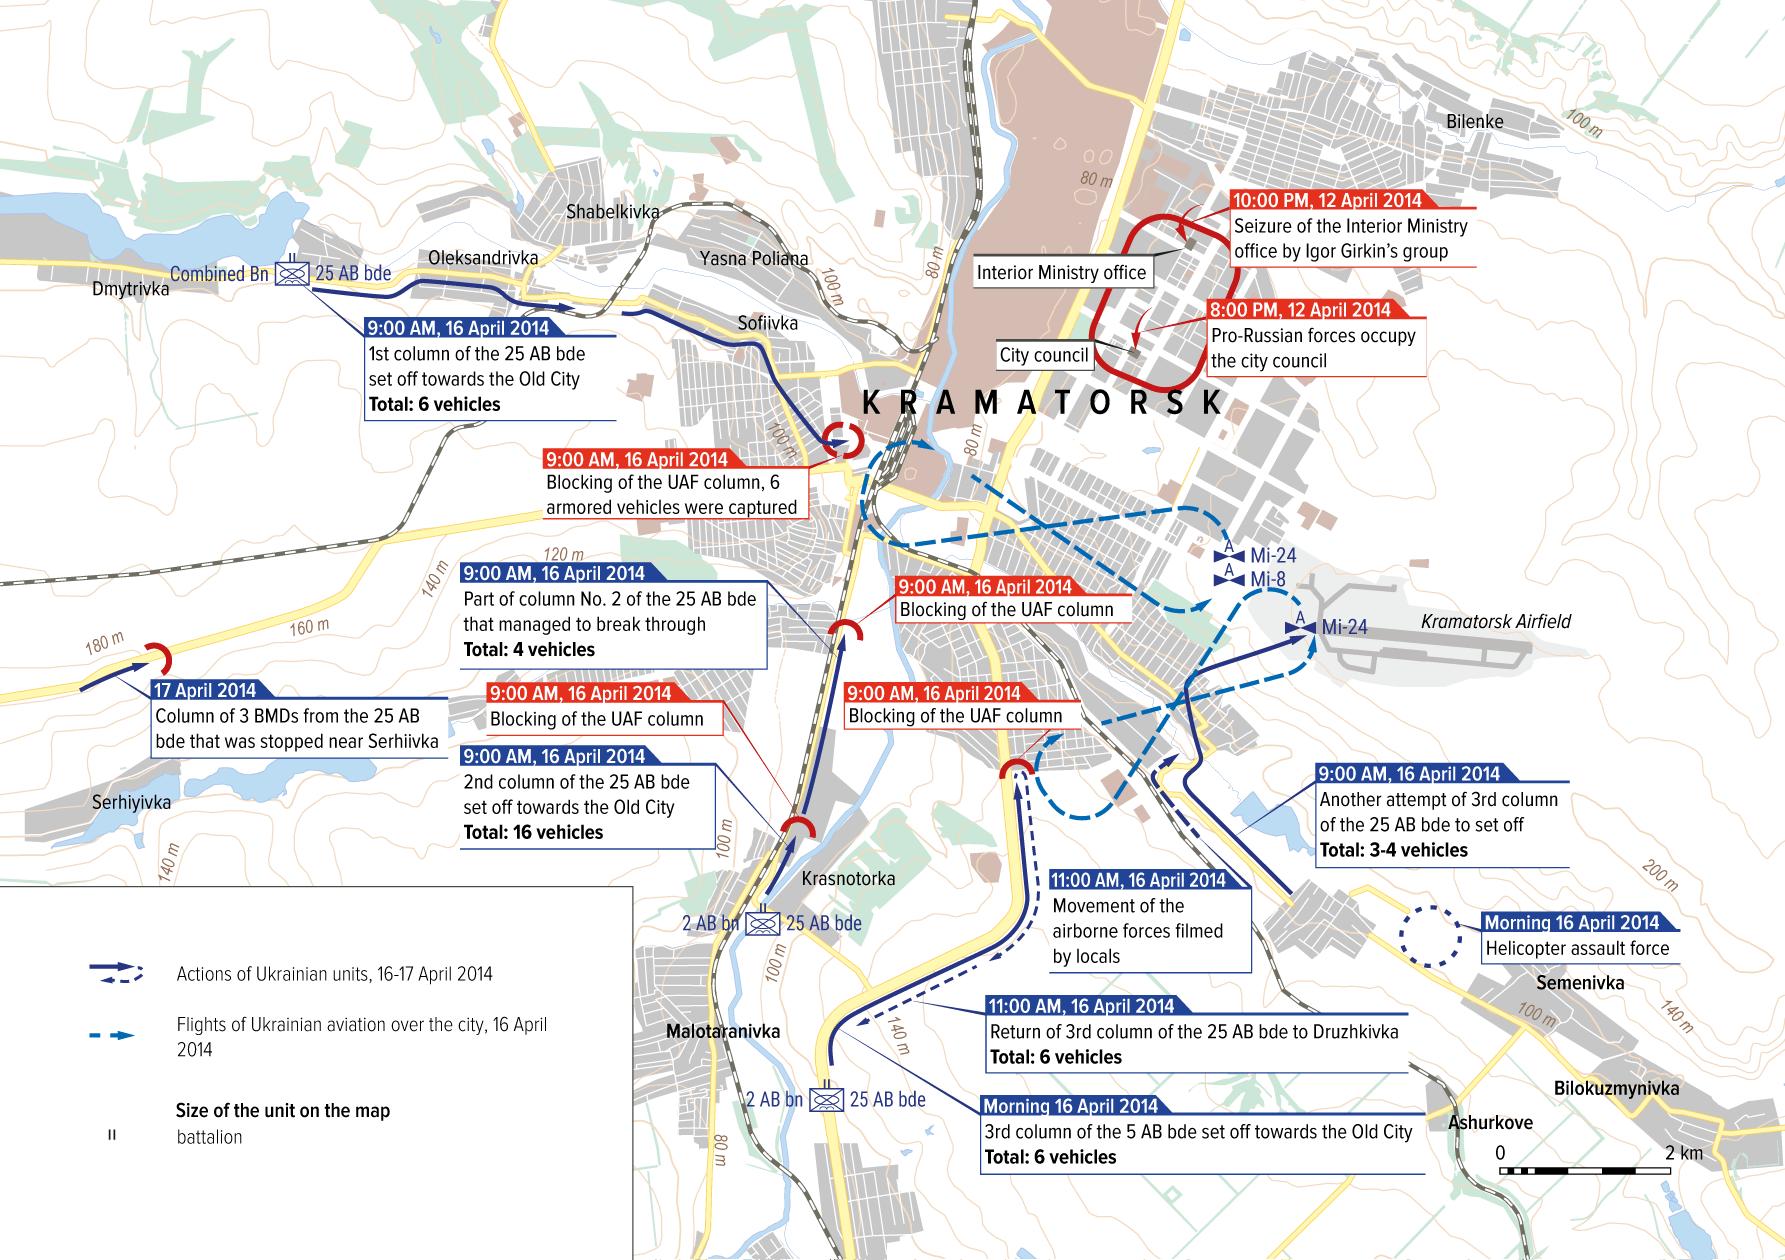 The situation in Kramatorsk. 16 April 2014.